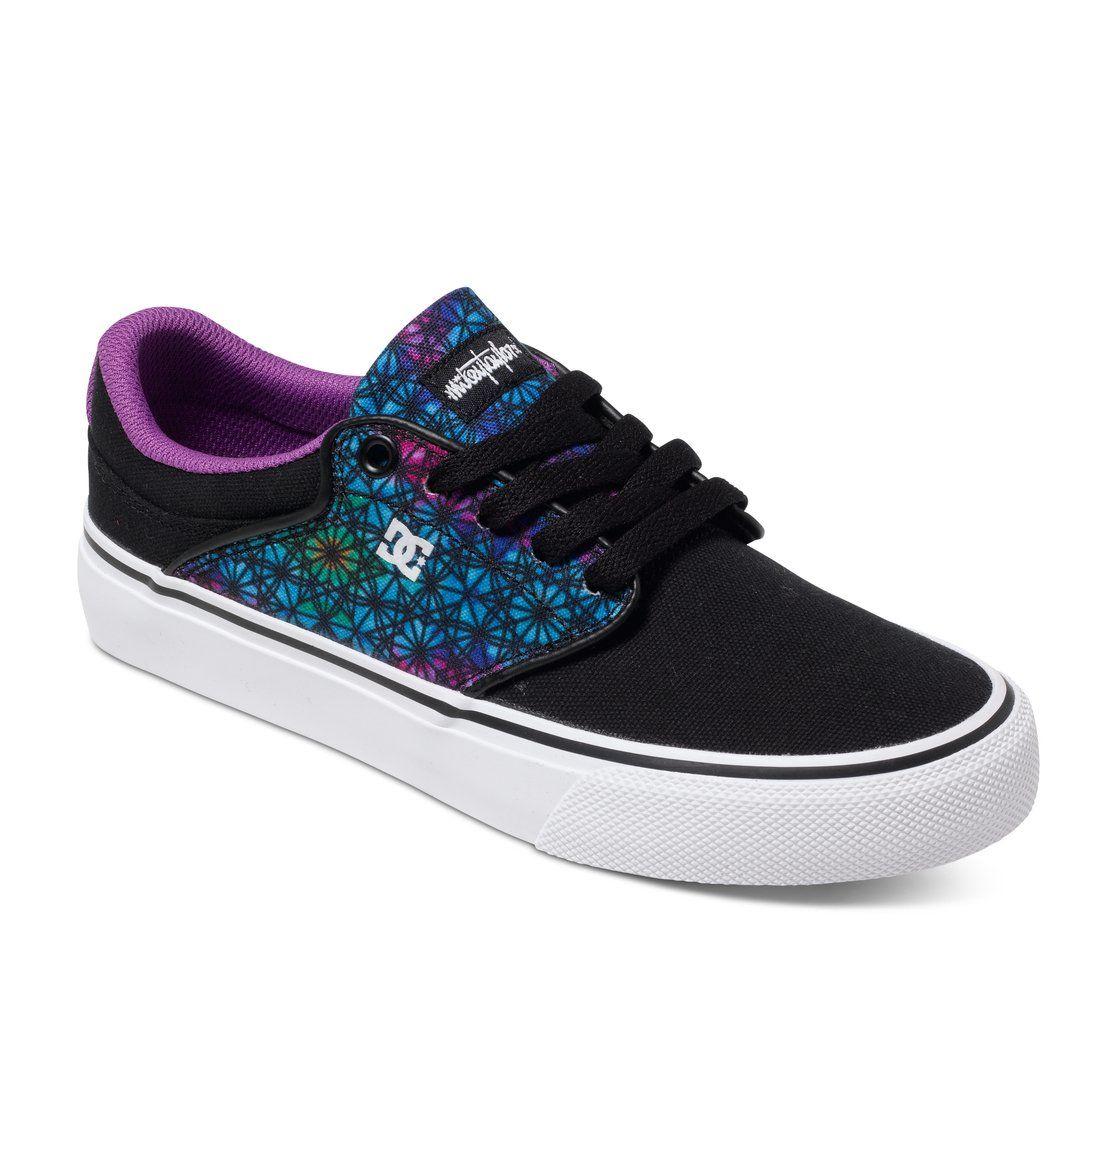 DC Shoes Mikey Taylor Vulc SP - Low-Top Shoes - Zapatillas de caña baja - Mujer iswgyr3